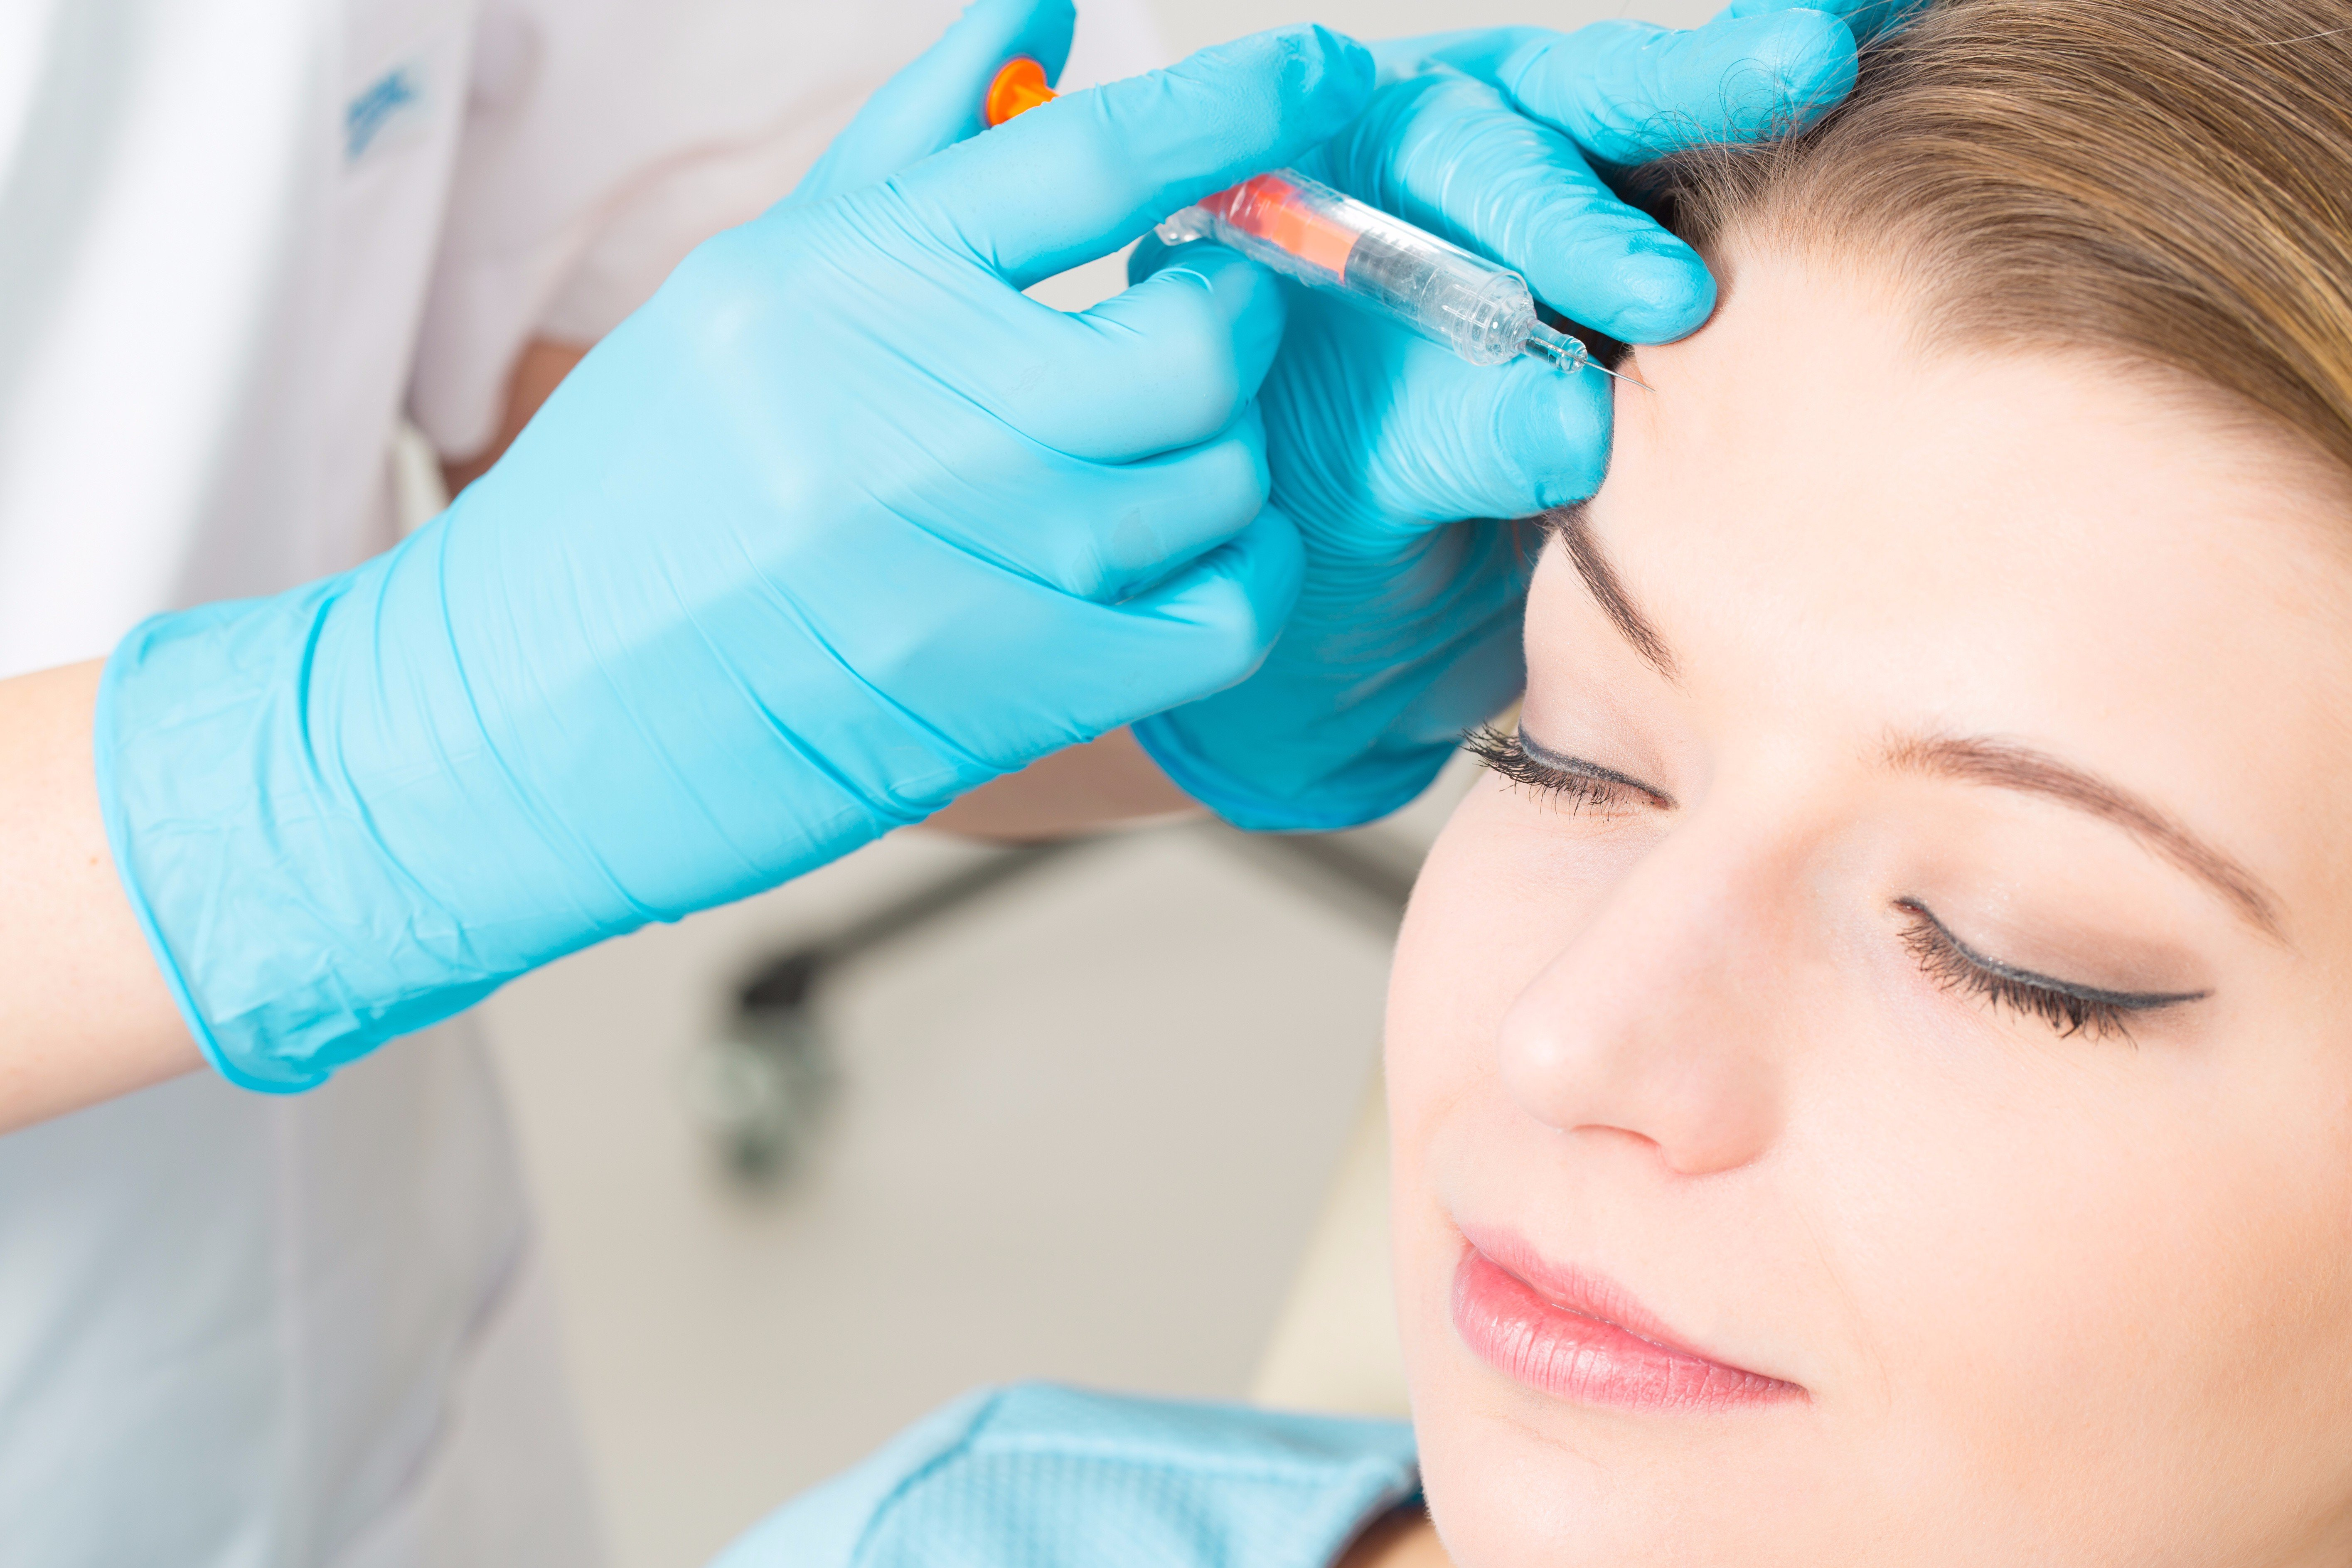 5 Hidden Benefits of Botox That Will Surprise You